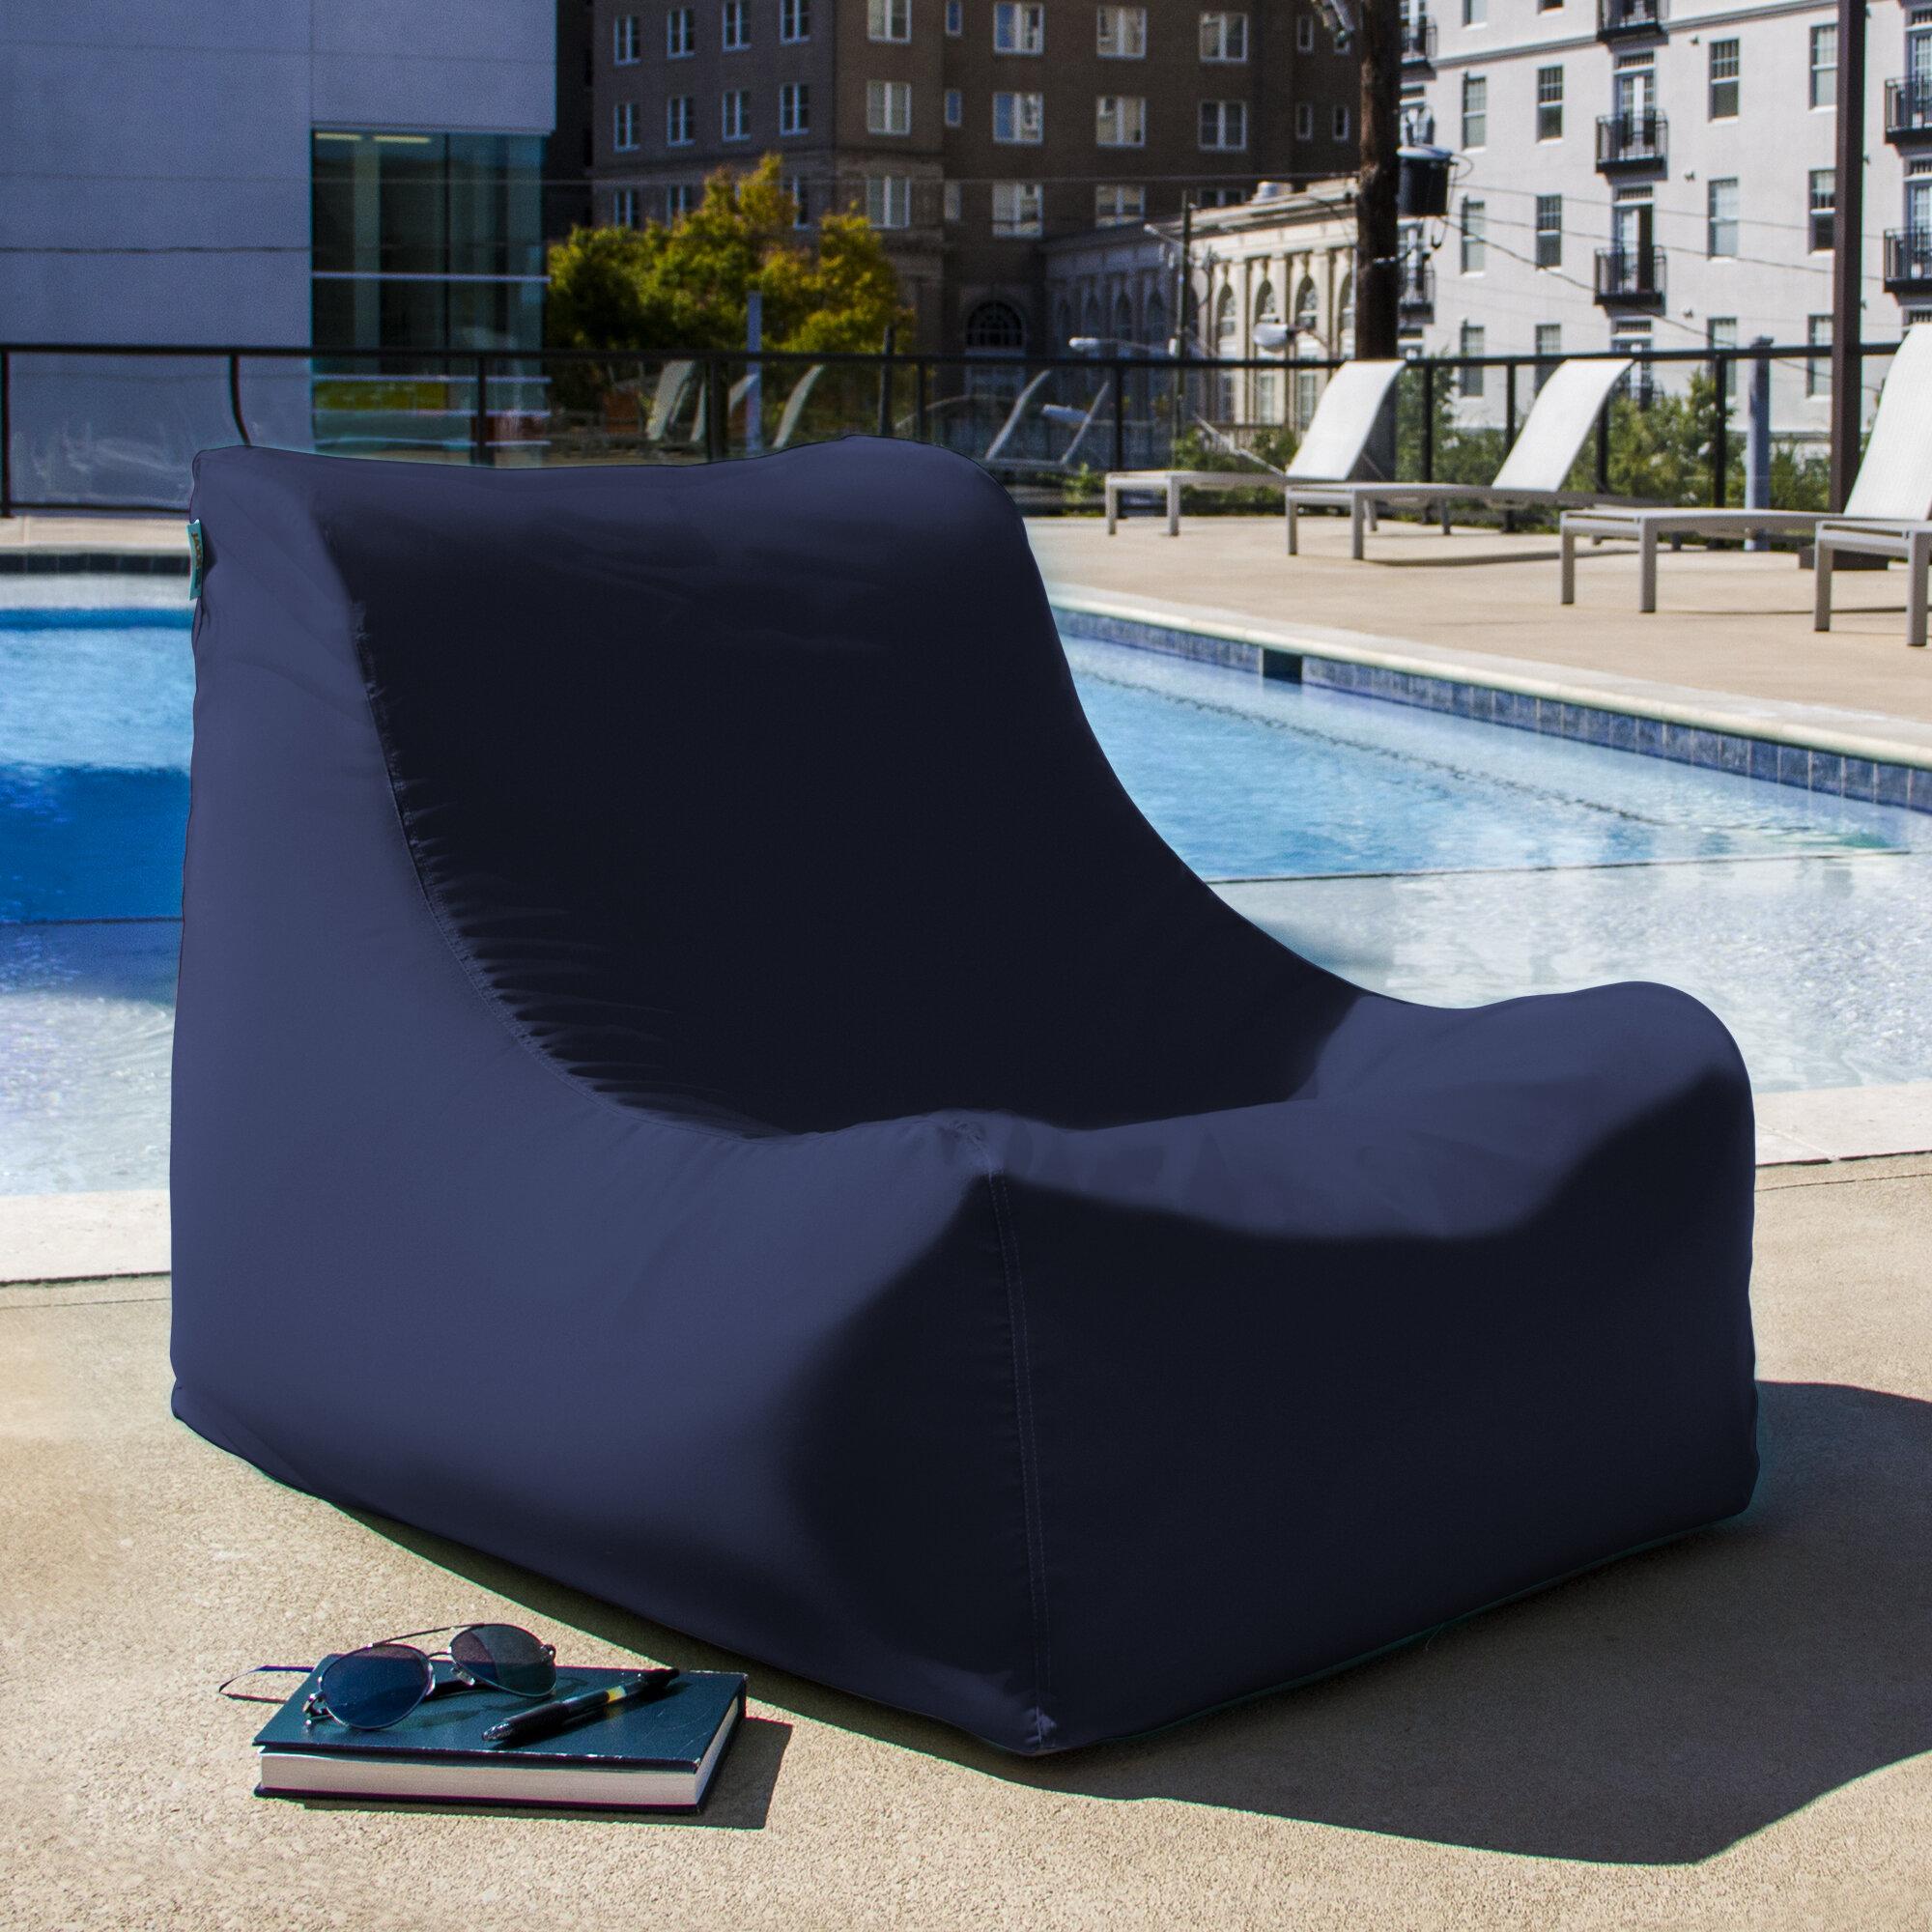 Jaxx Ponce Outdoor Patio Lounge Chair Reviews Wayfair